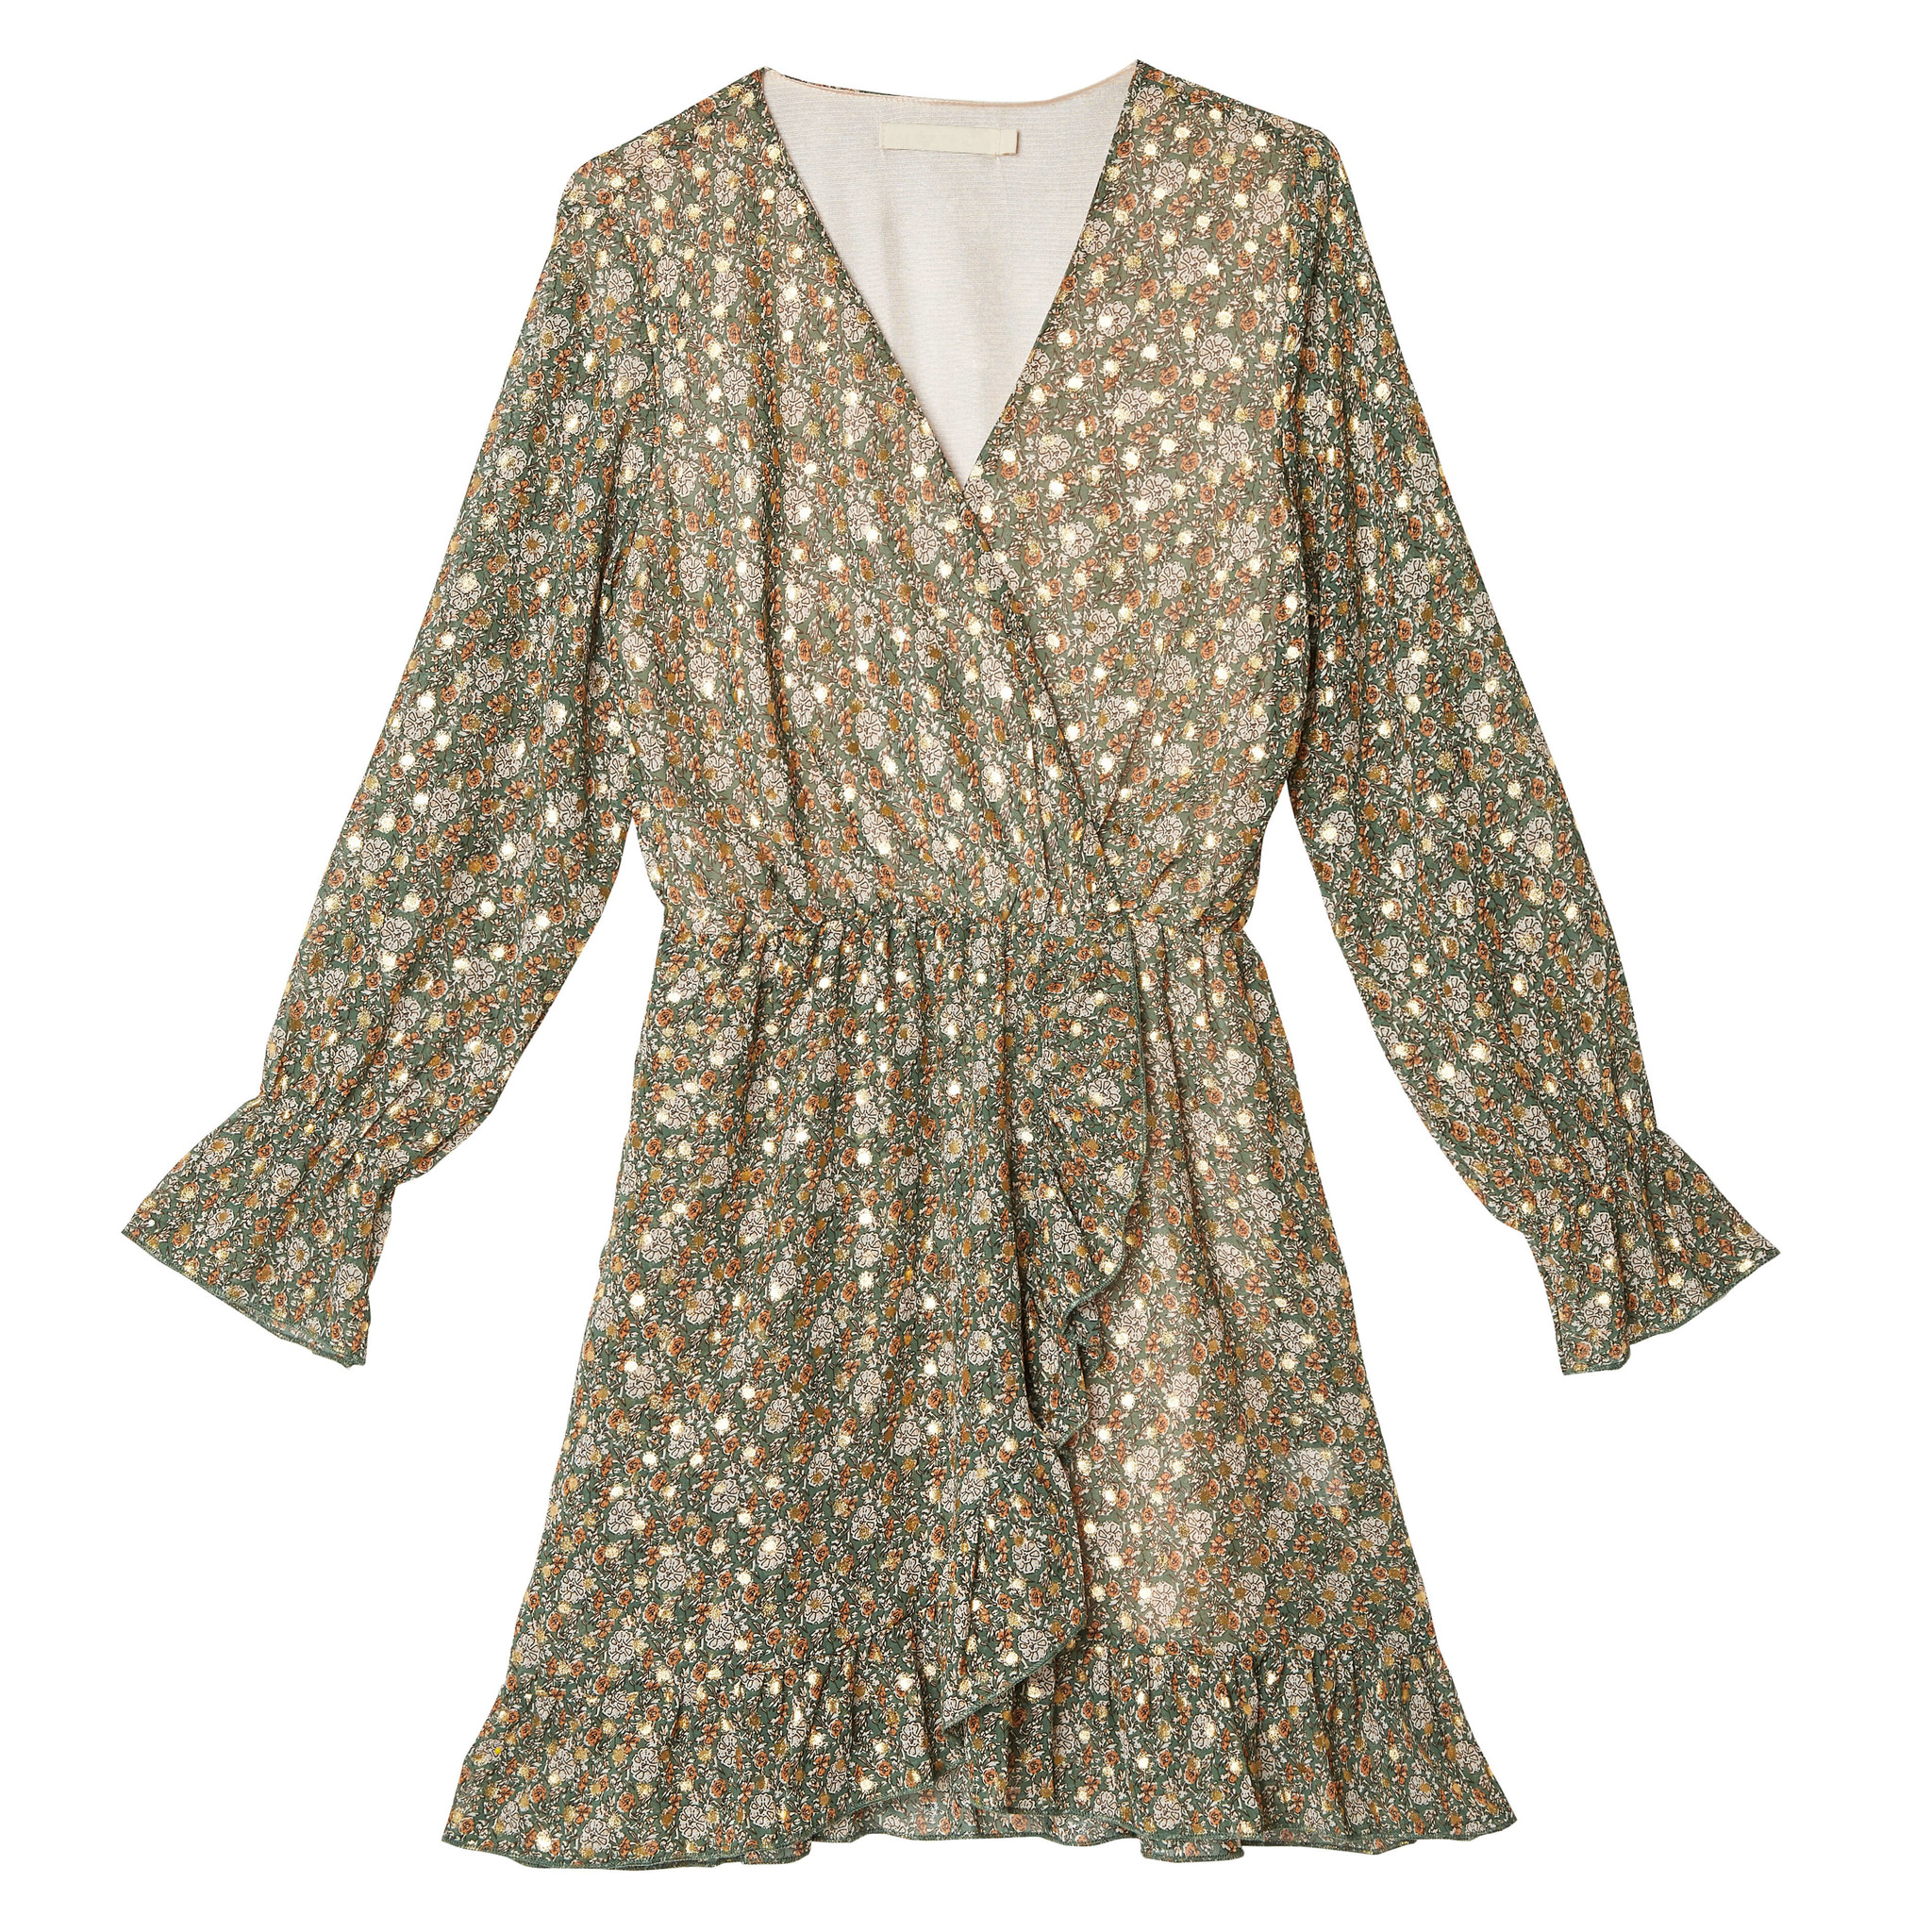 YW Axelle Long Sleeve Dress Autumn Green